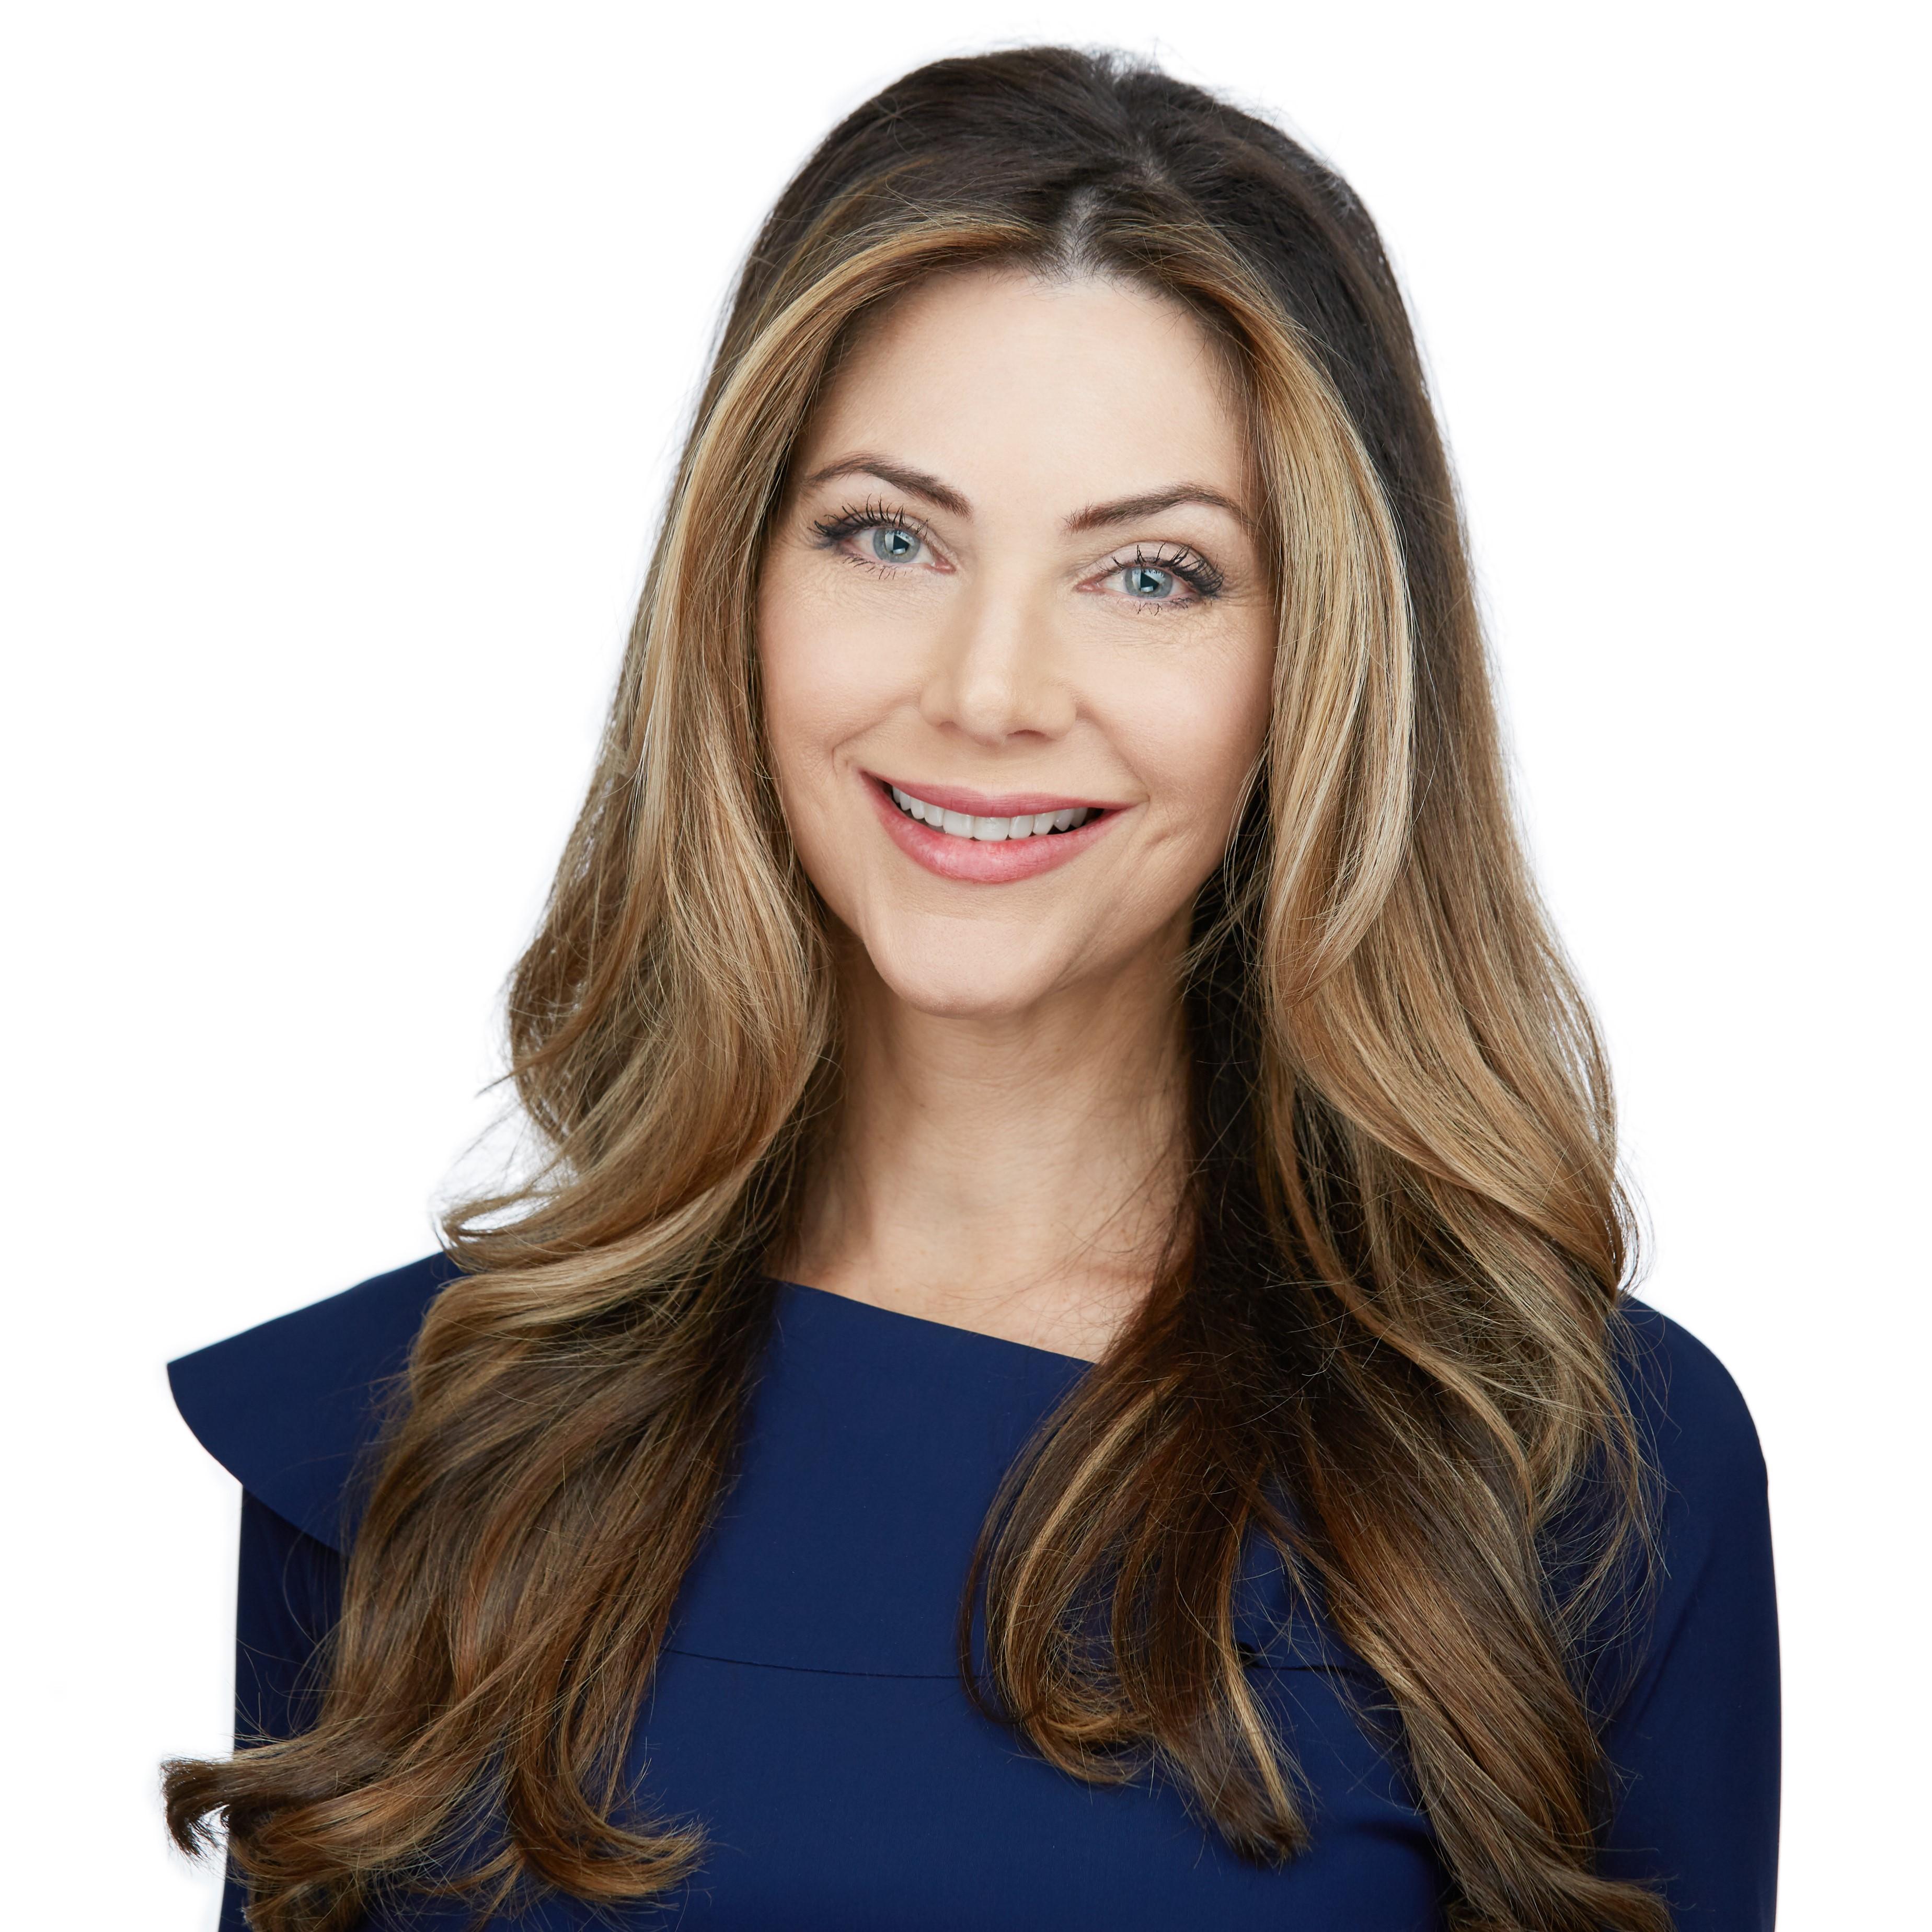 Kay Self - Executive Director, VisionGreenwood